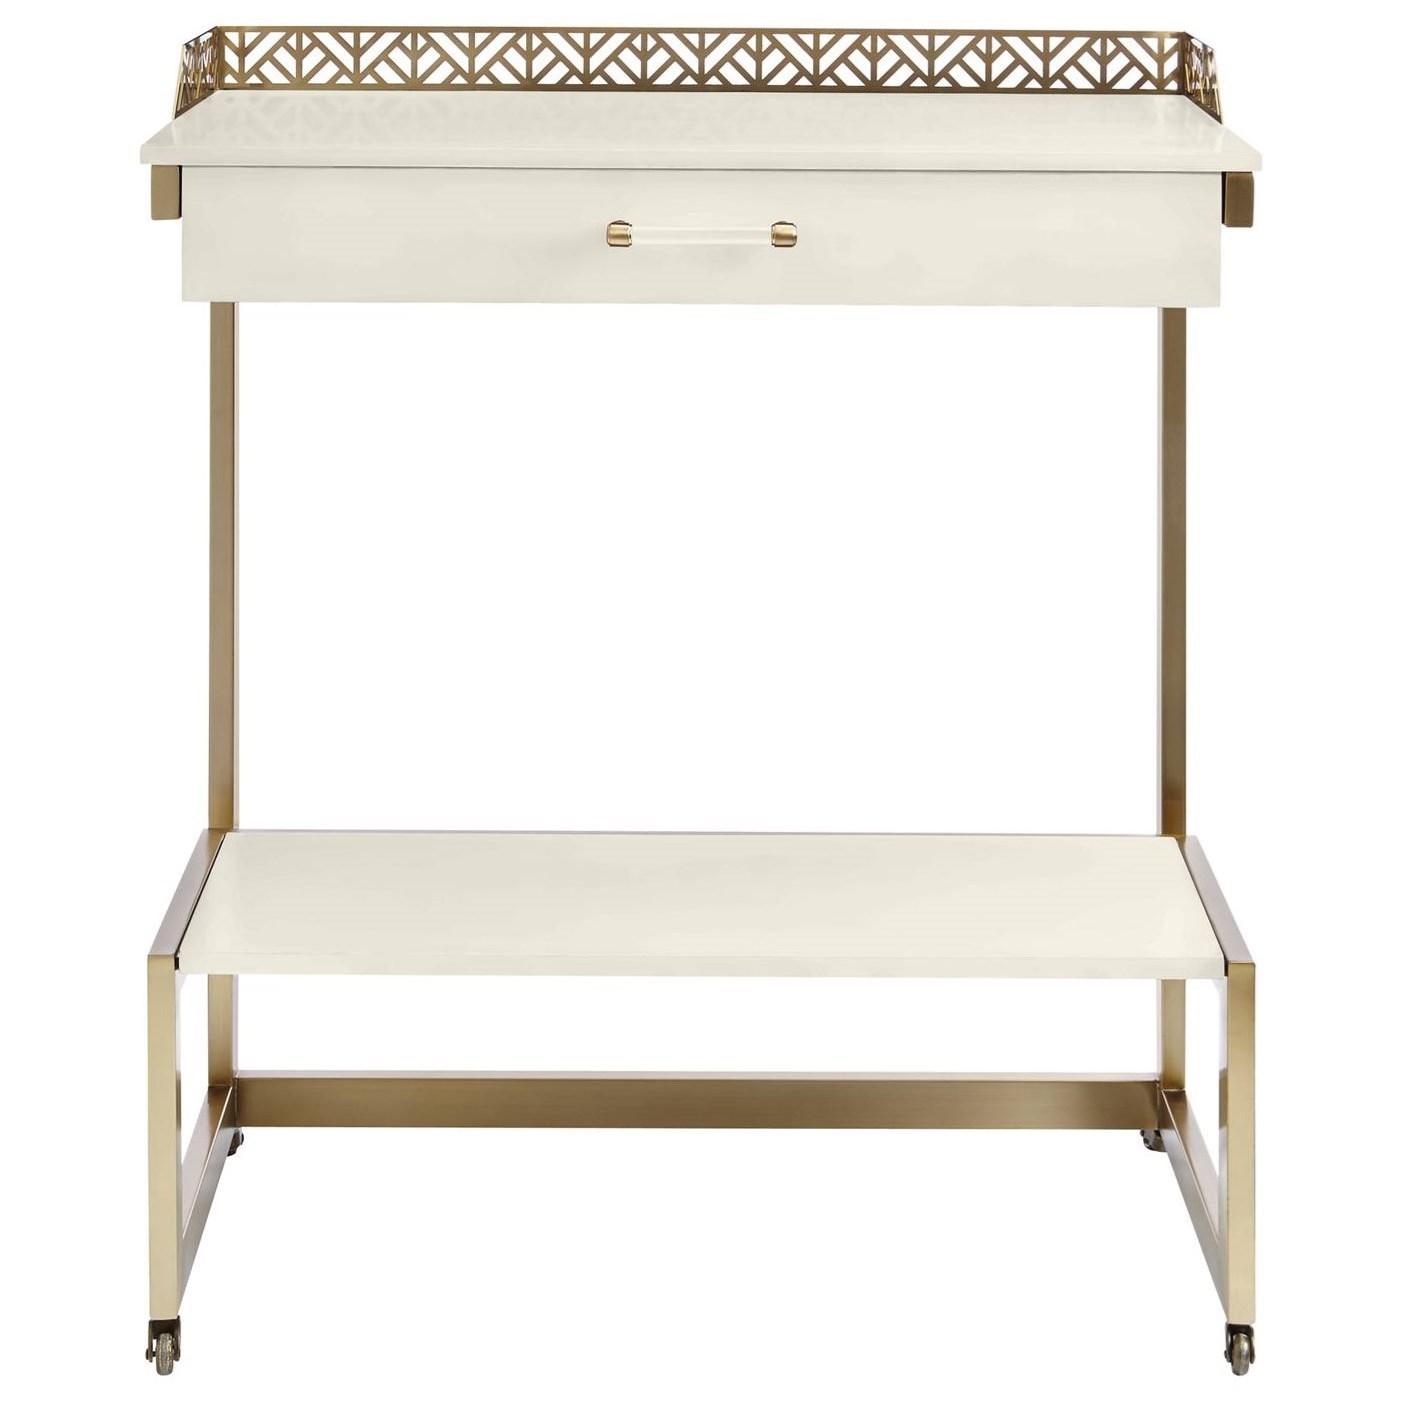 Stanley Furniture Coastal Living Oasis Catalina Bar Cart - Item Number: 527-21-08